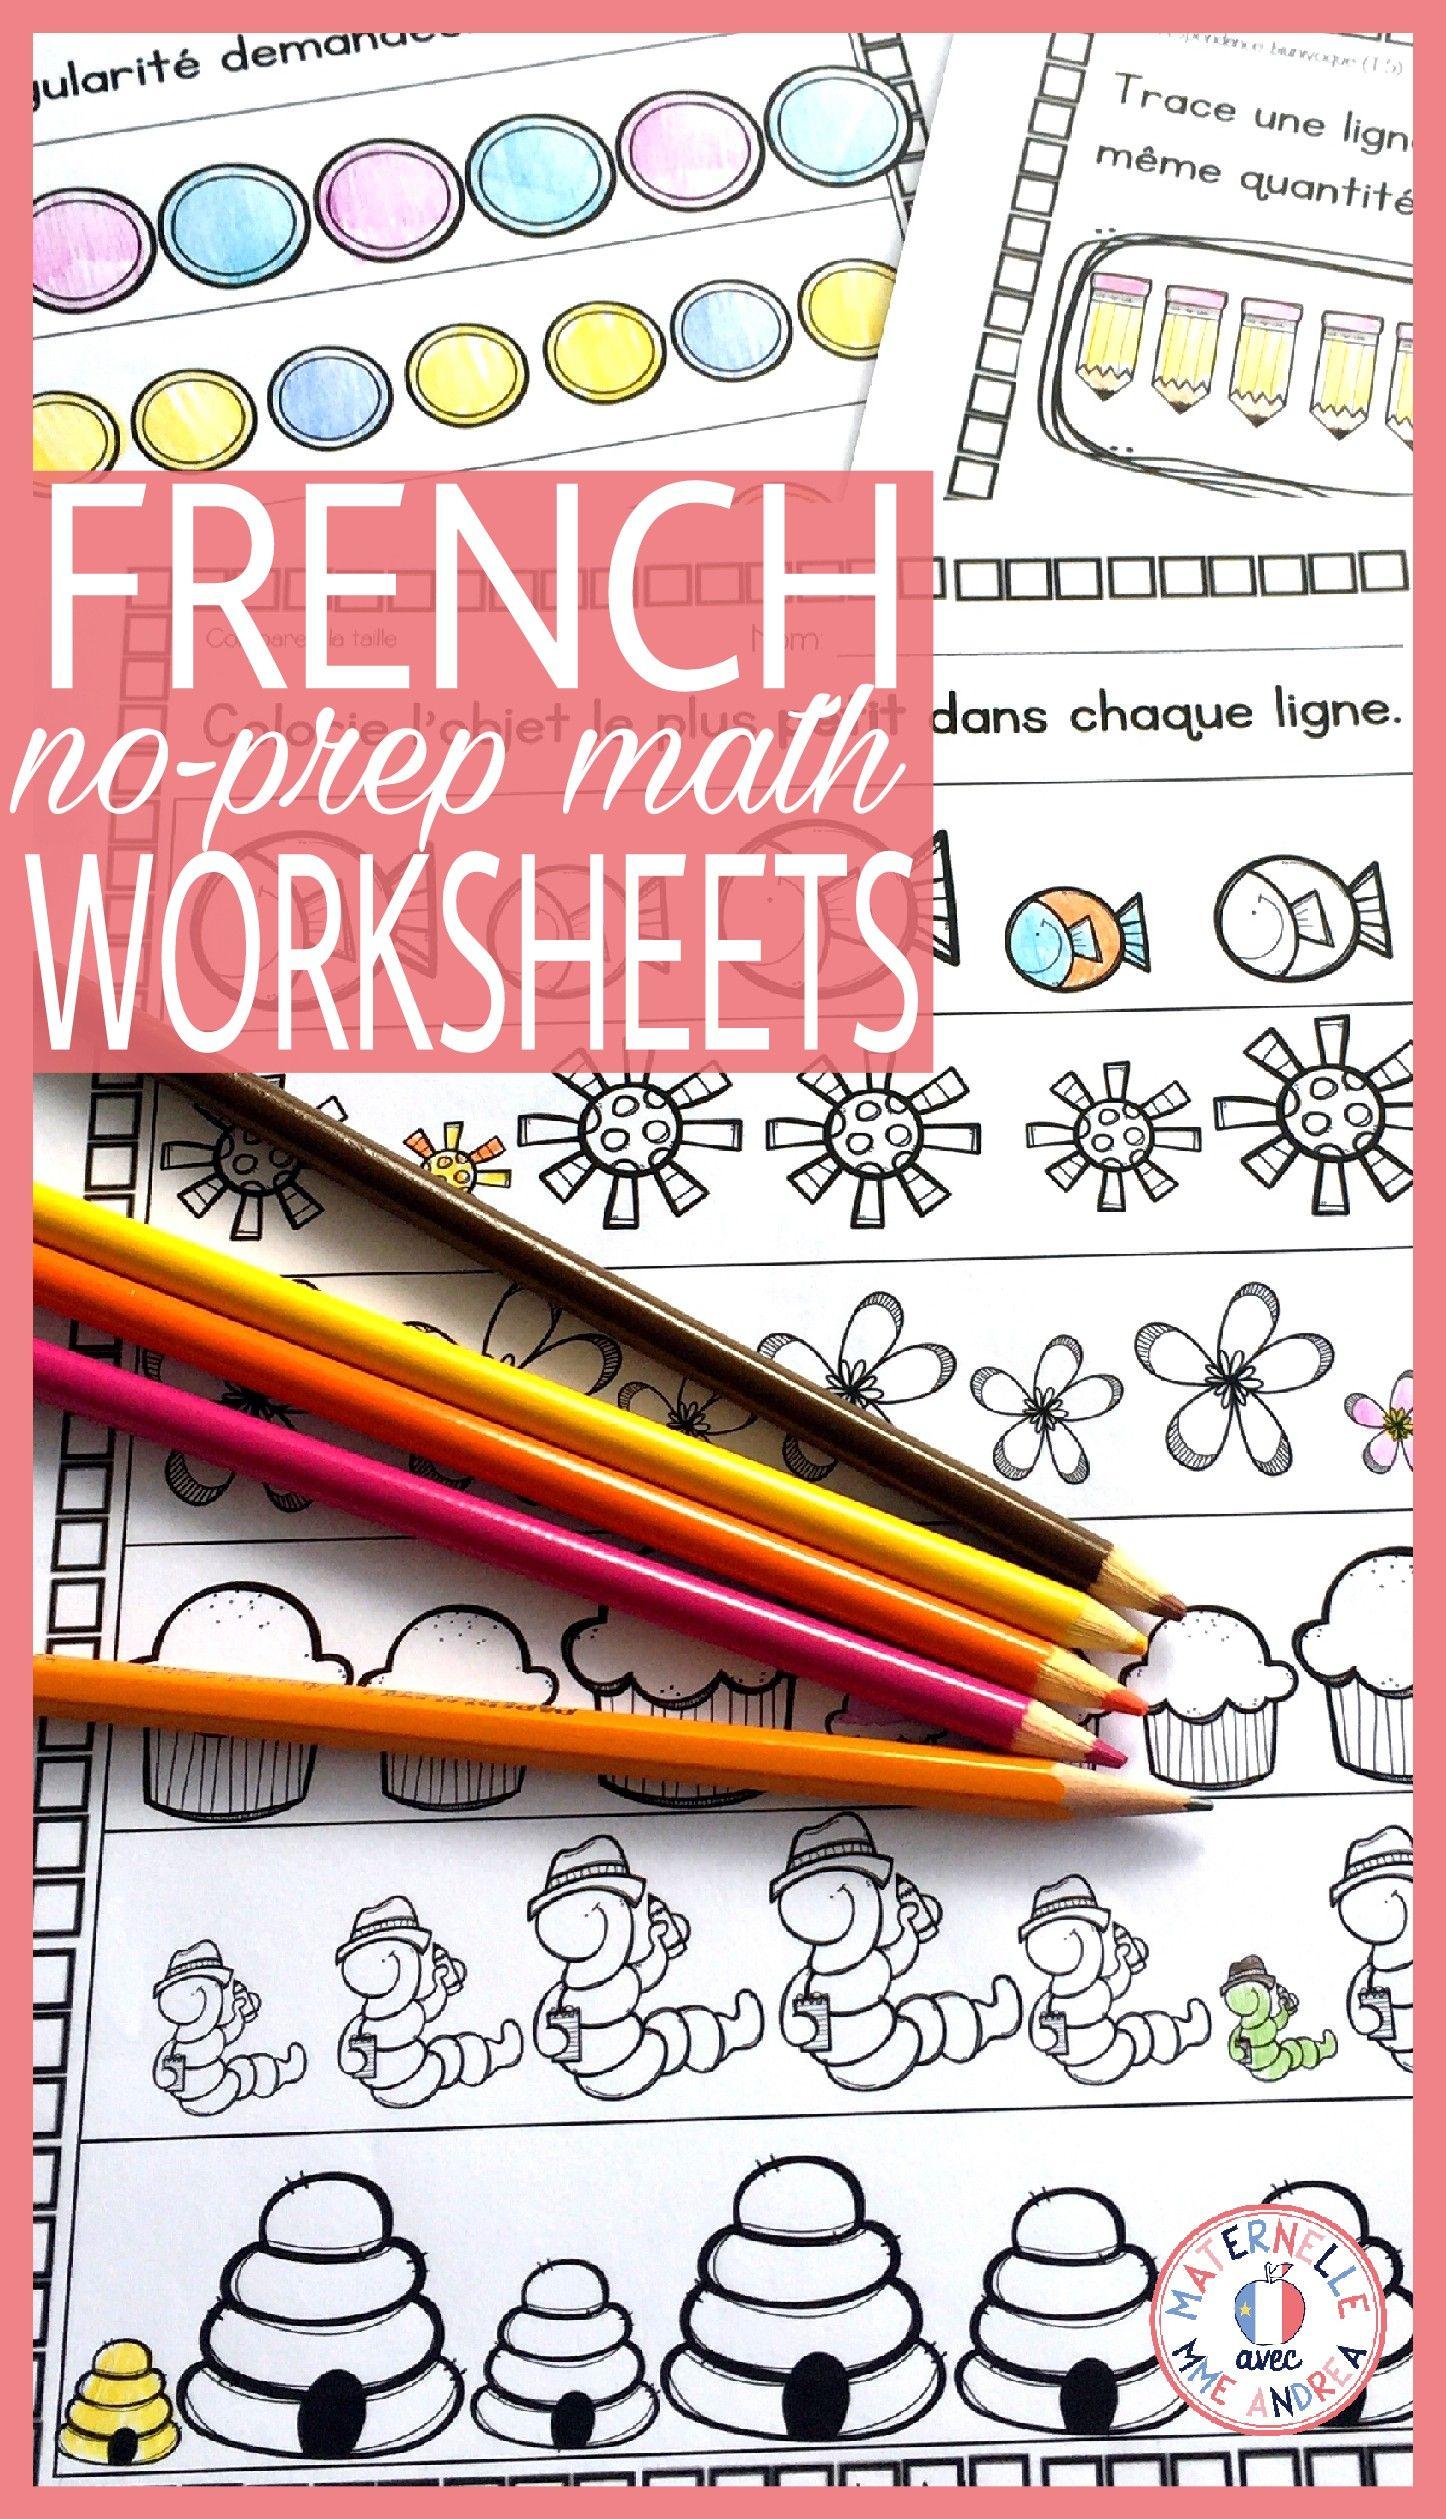 French Math Worksheets No Prep Kindergarten Maternelle Math Worksheets Math French Teaching Resources [ 2519 x 1446 Pixel ]